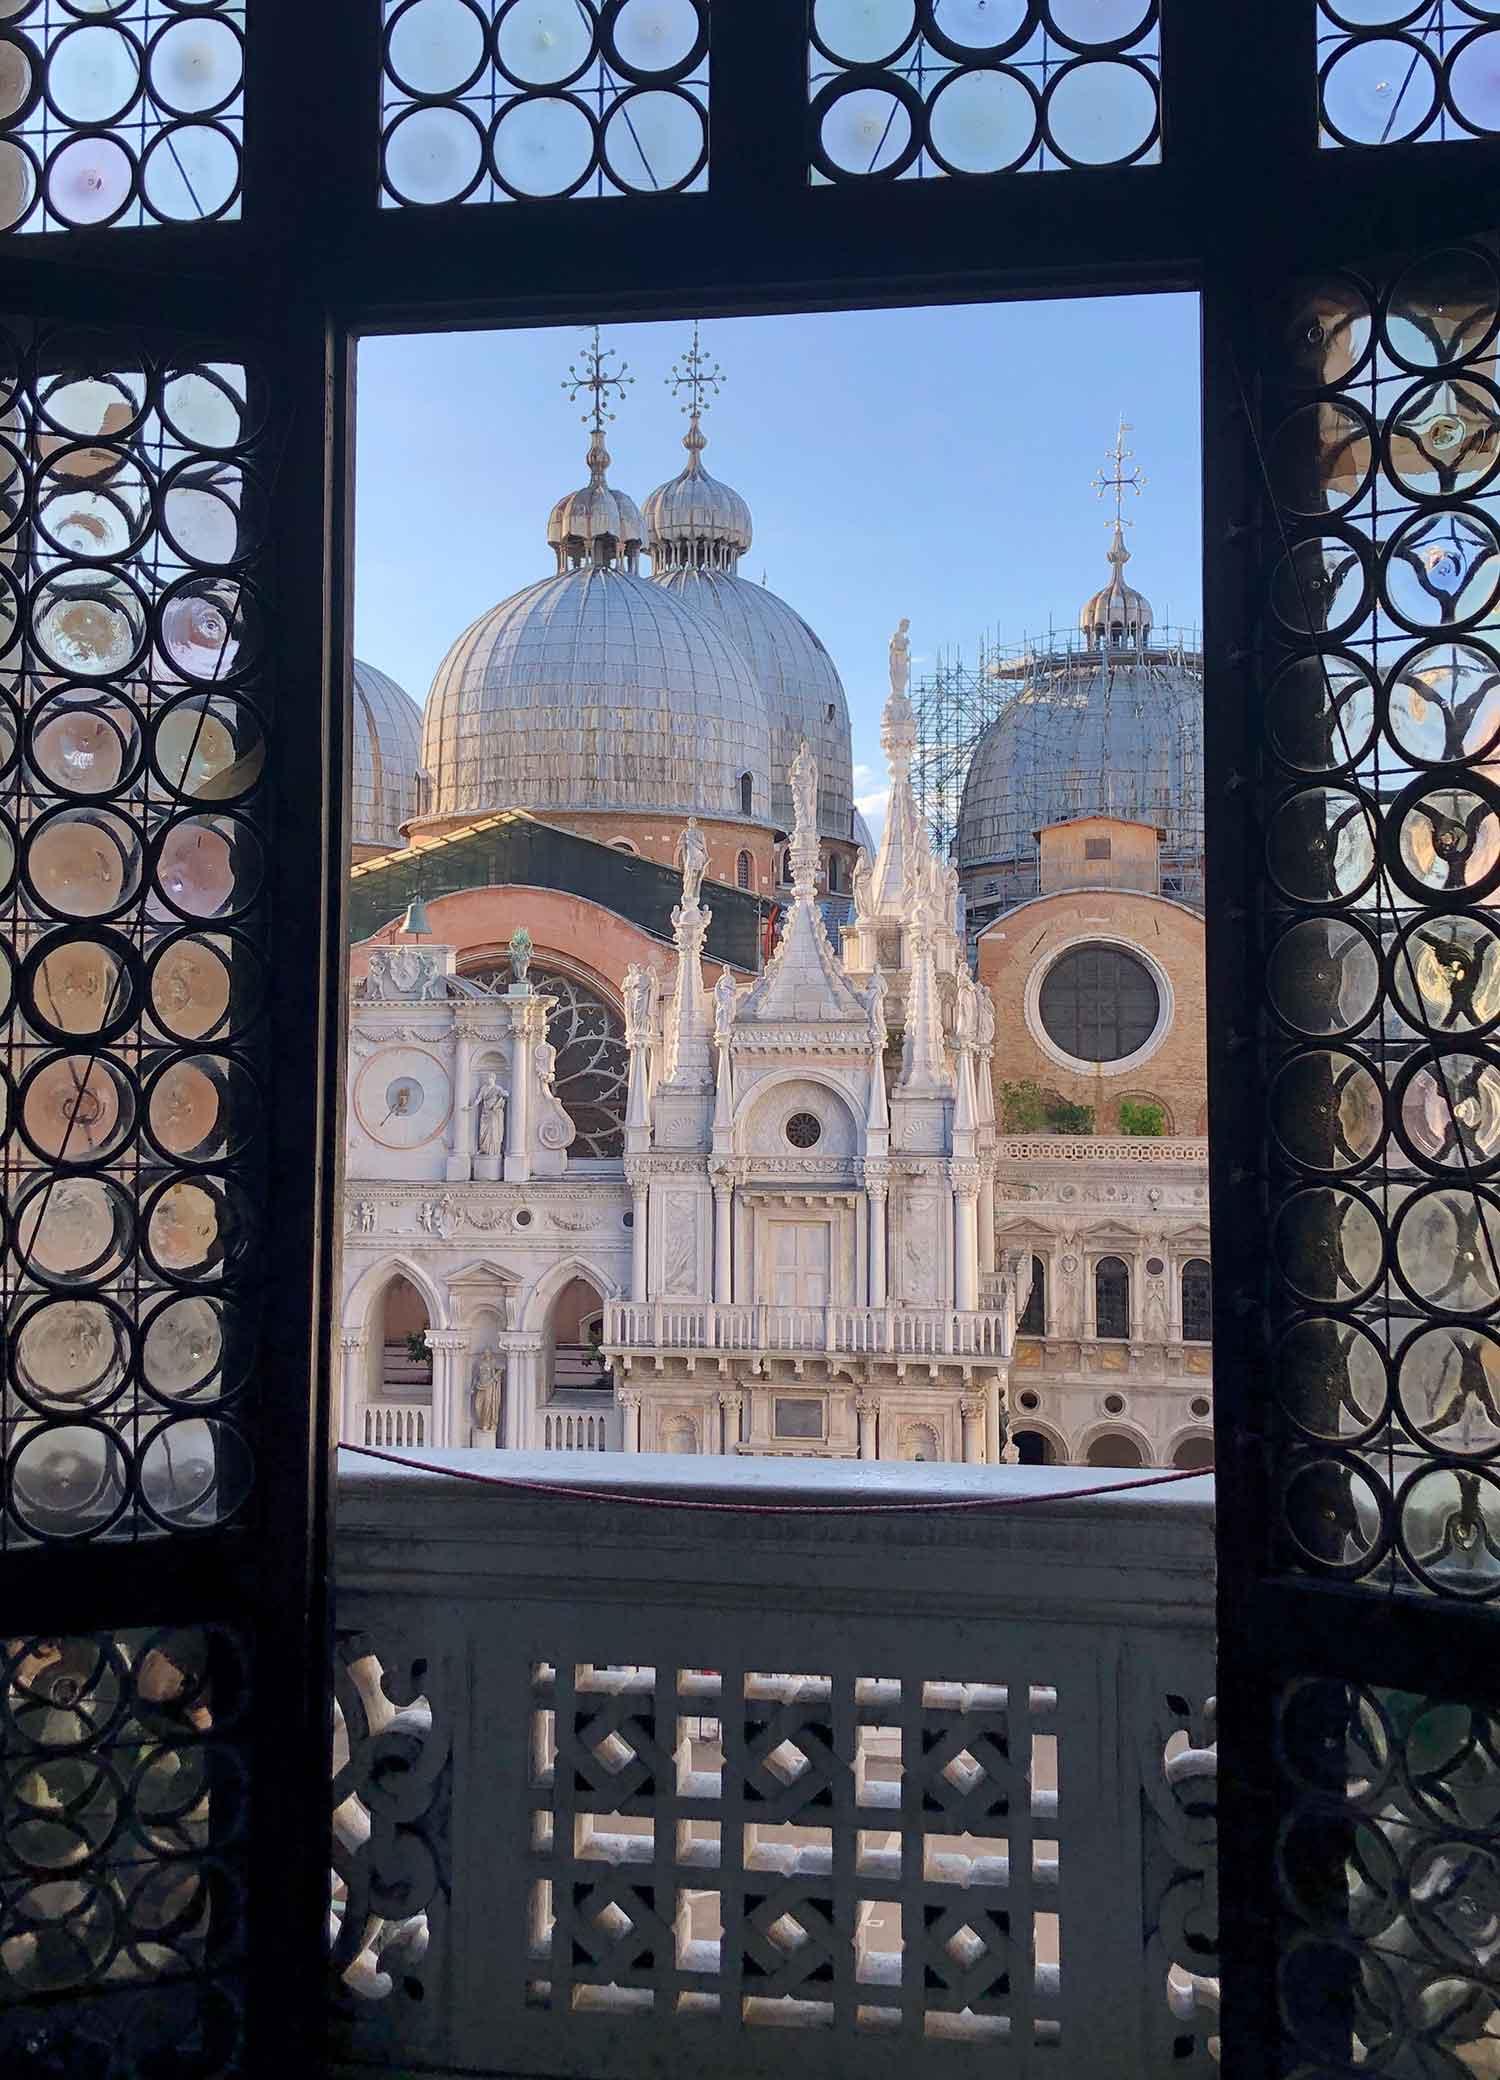 Inside Doges Palace Tour Venice Italy